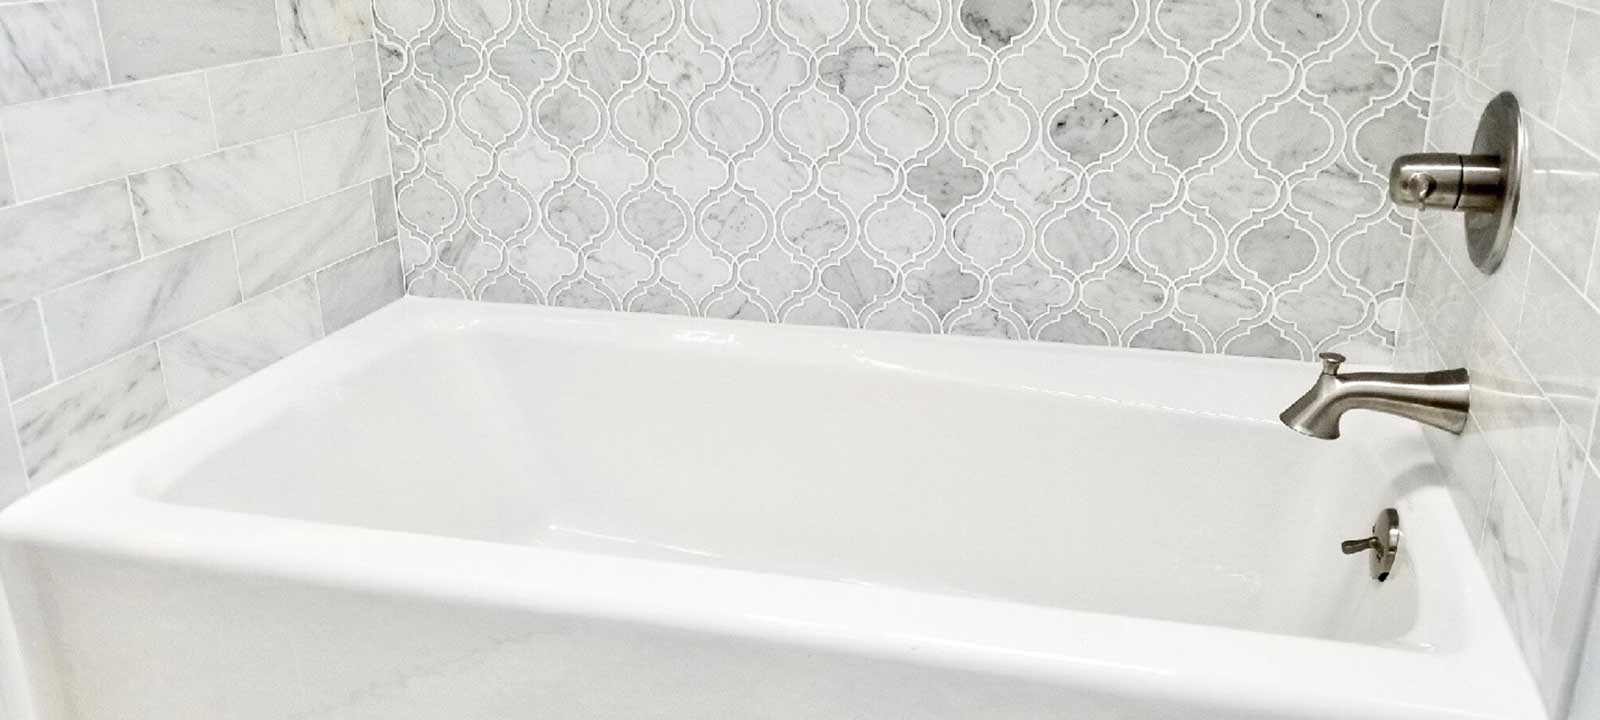 magnl_header_bath-american-standards